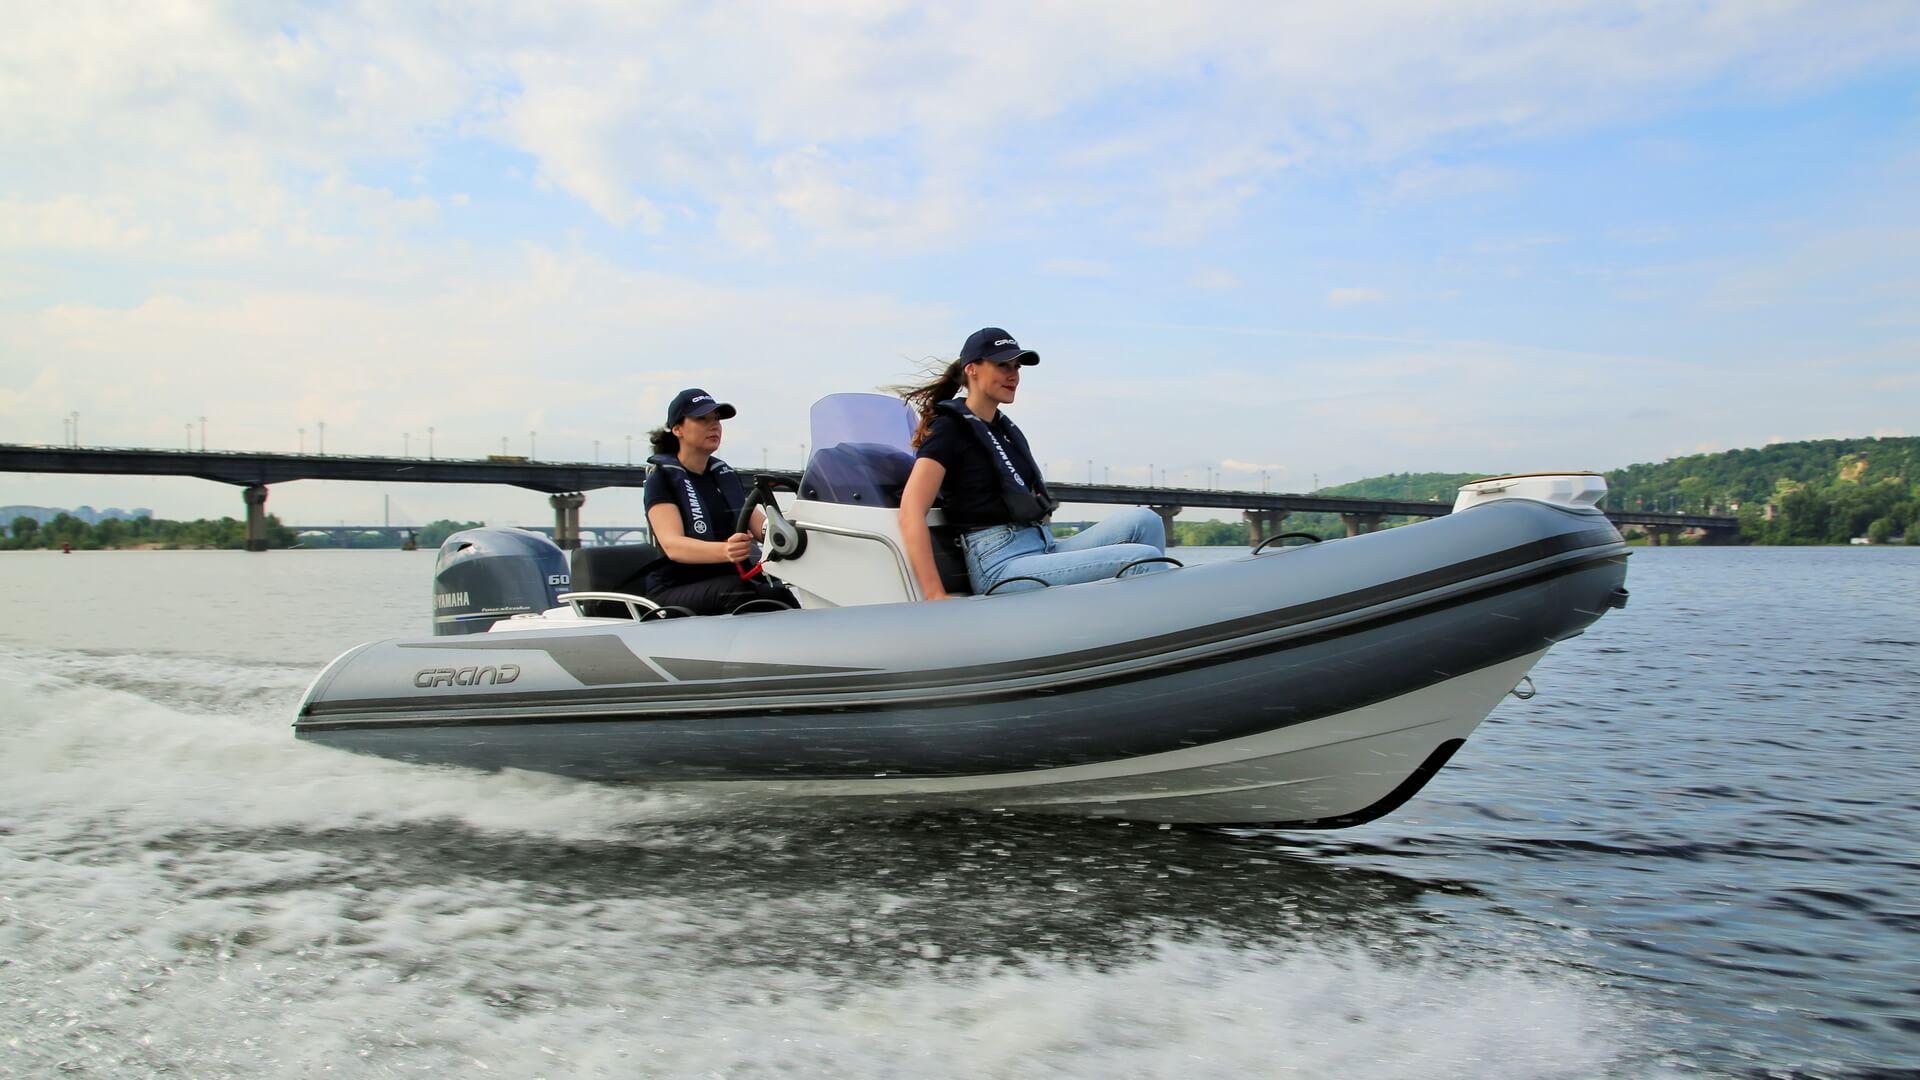 Надувная лодка с жестким дном GRAND Golden Line G420, Надувная лодка GRAND Golden Line G420, GRAND Golden Line G420, GRAND G420, Надувная лодка GRAND, Надувная лодка ГРАНД, Надувная лодка с жестким дном, RIB, Rigid Inflatable Boats